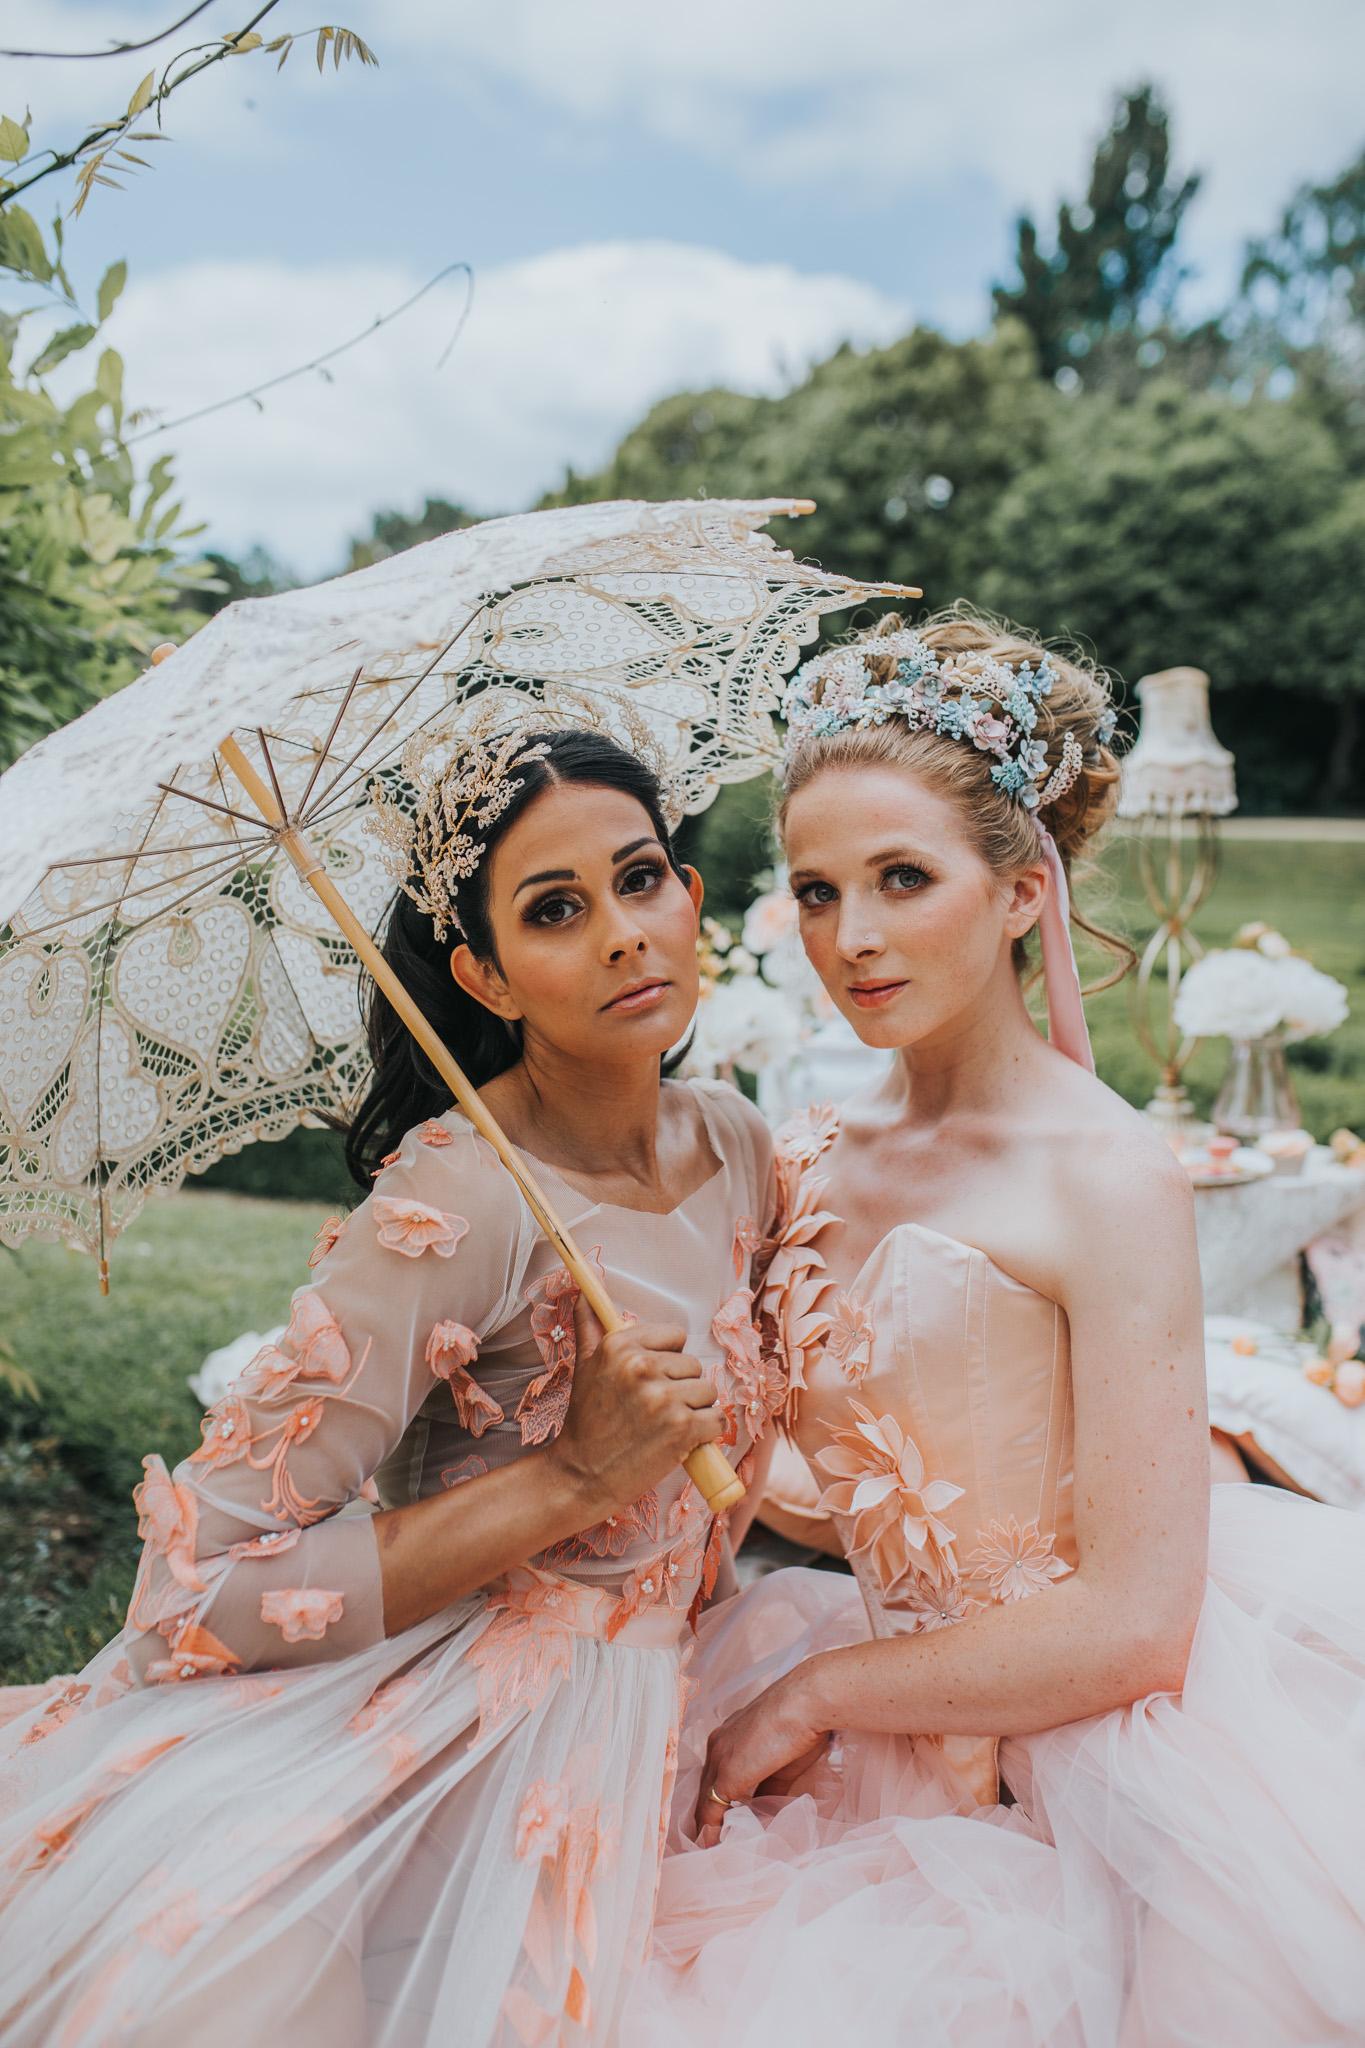 bridgerton wedding - whimsical wedding - pink wedding dress - vintage wedding - unique bridal wear - unique bridal accessories